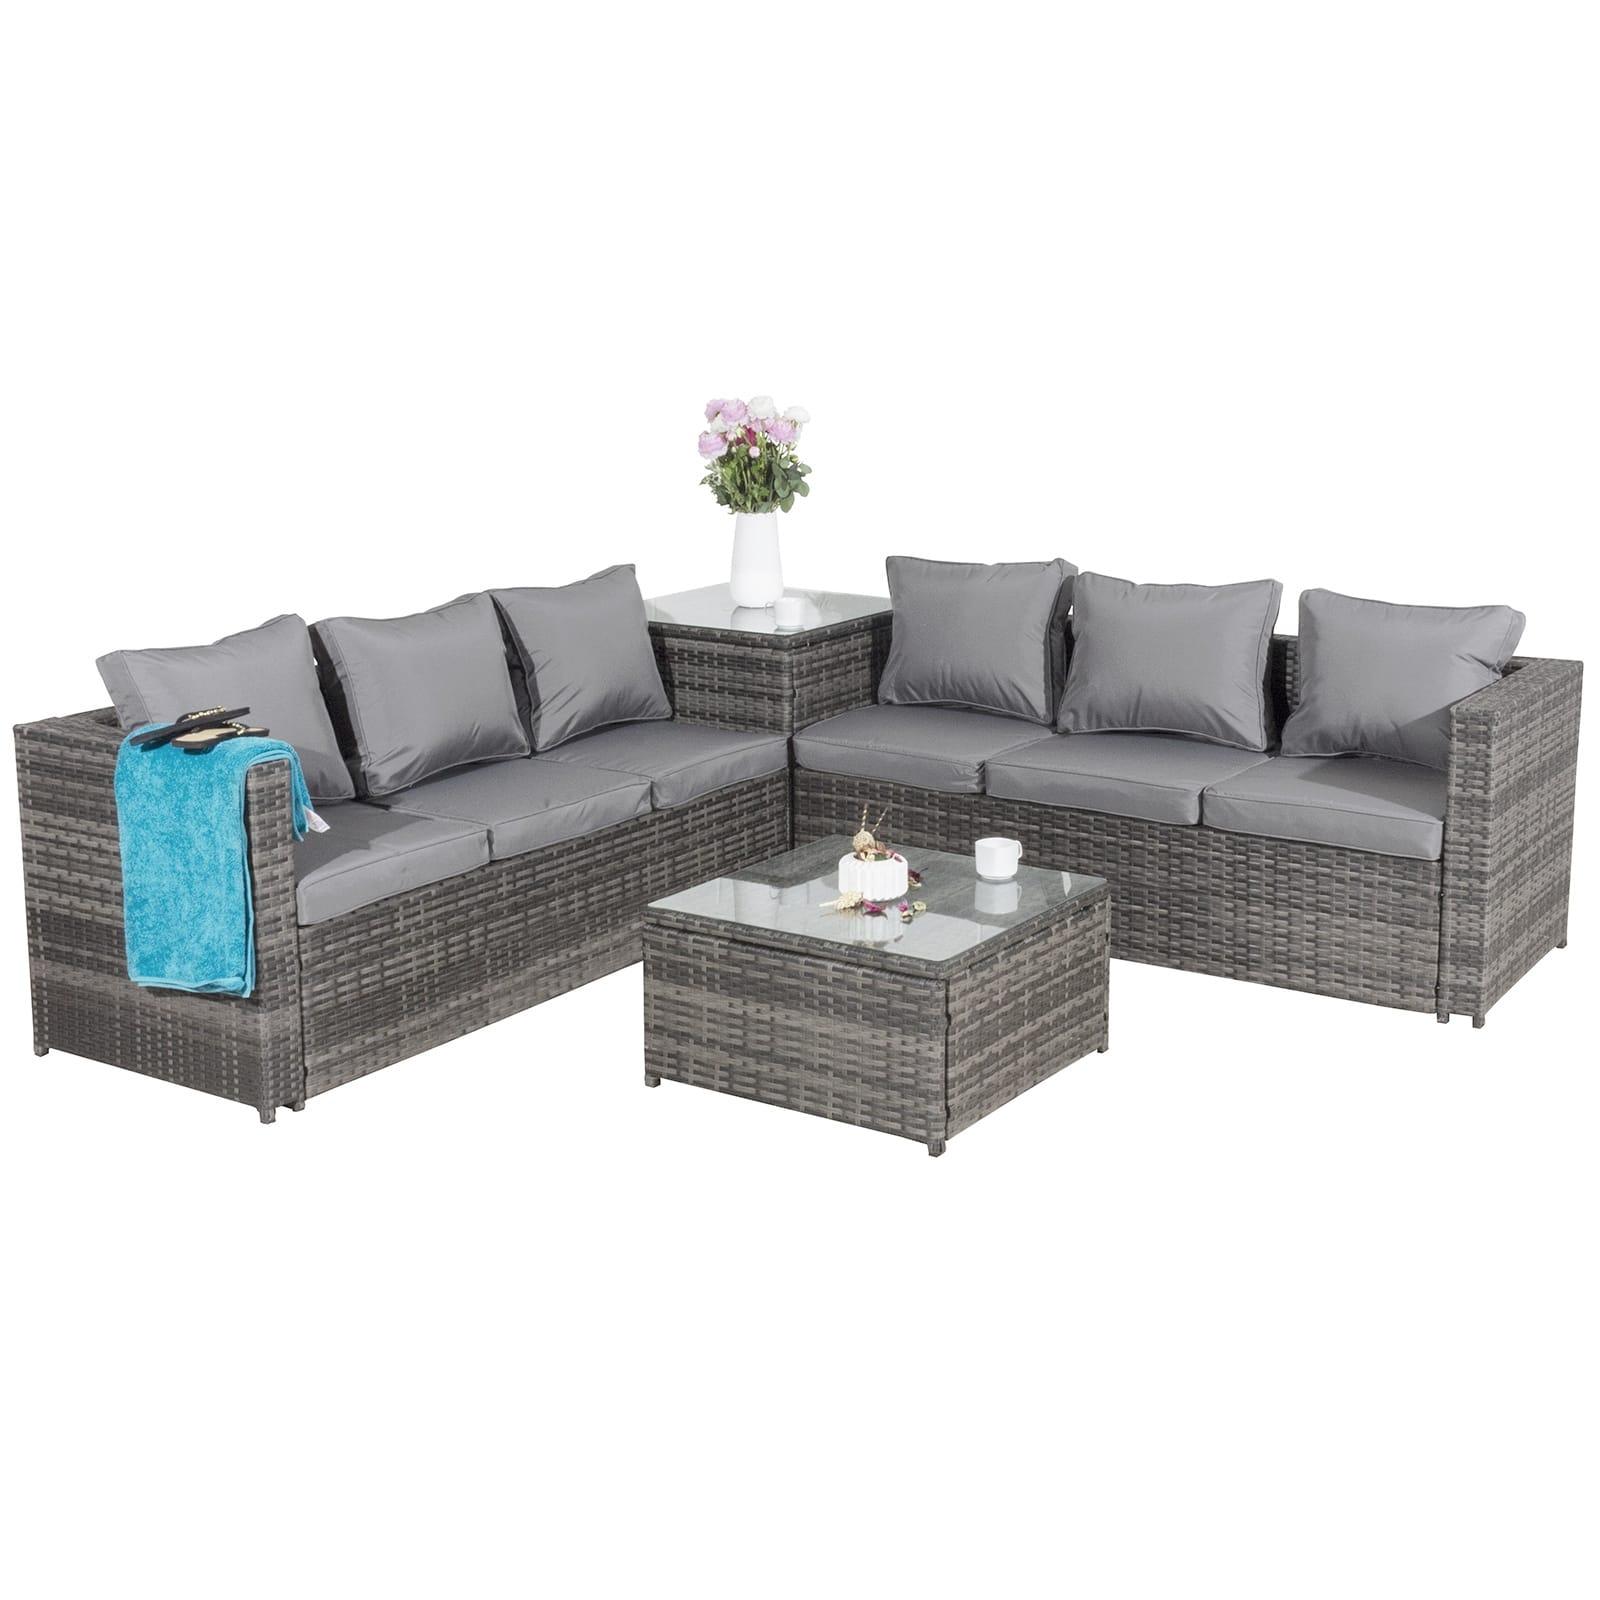 Oseasons® Malta rattan 6 seater corner sofa set